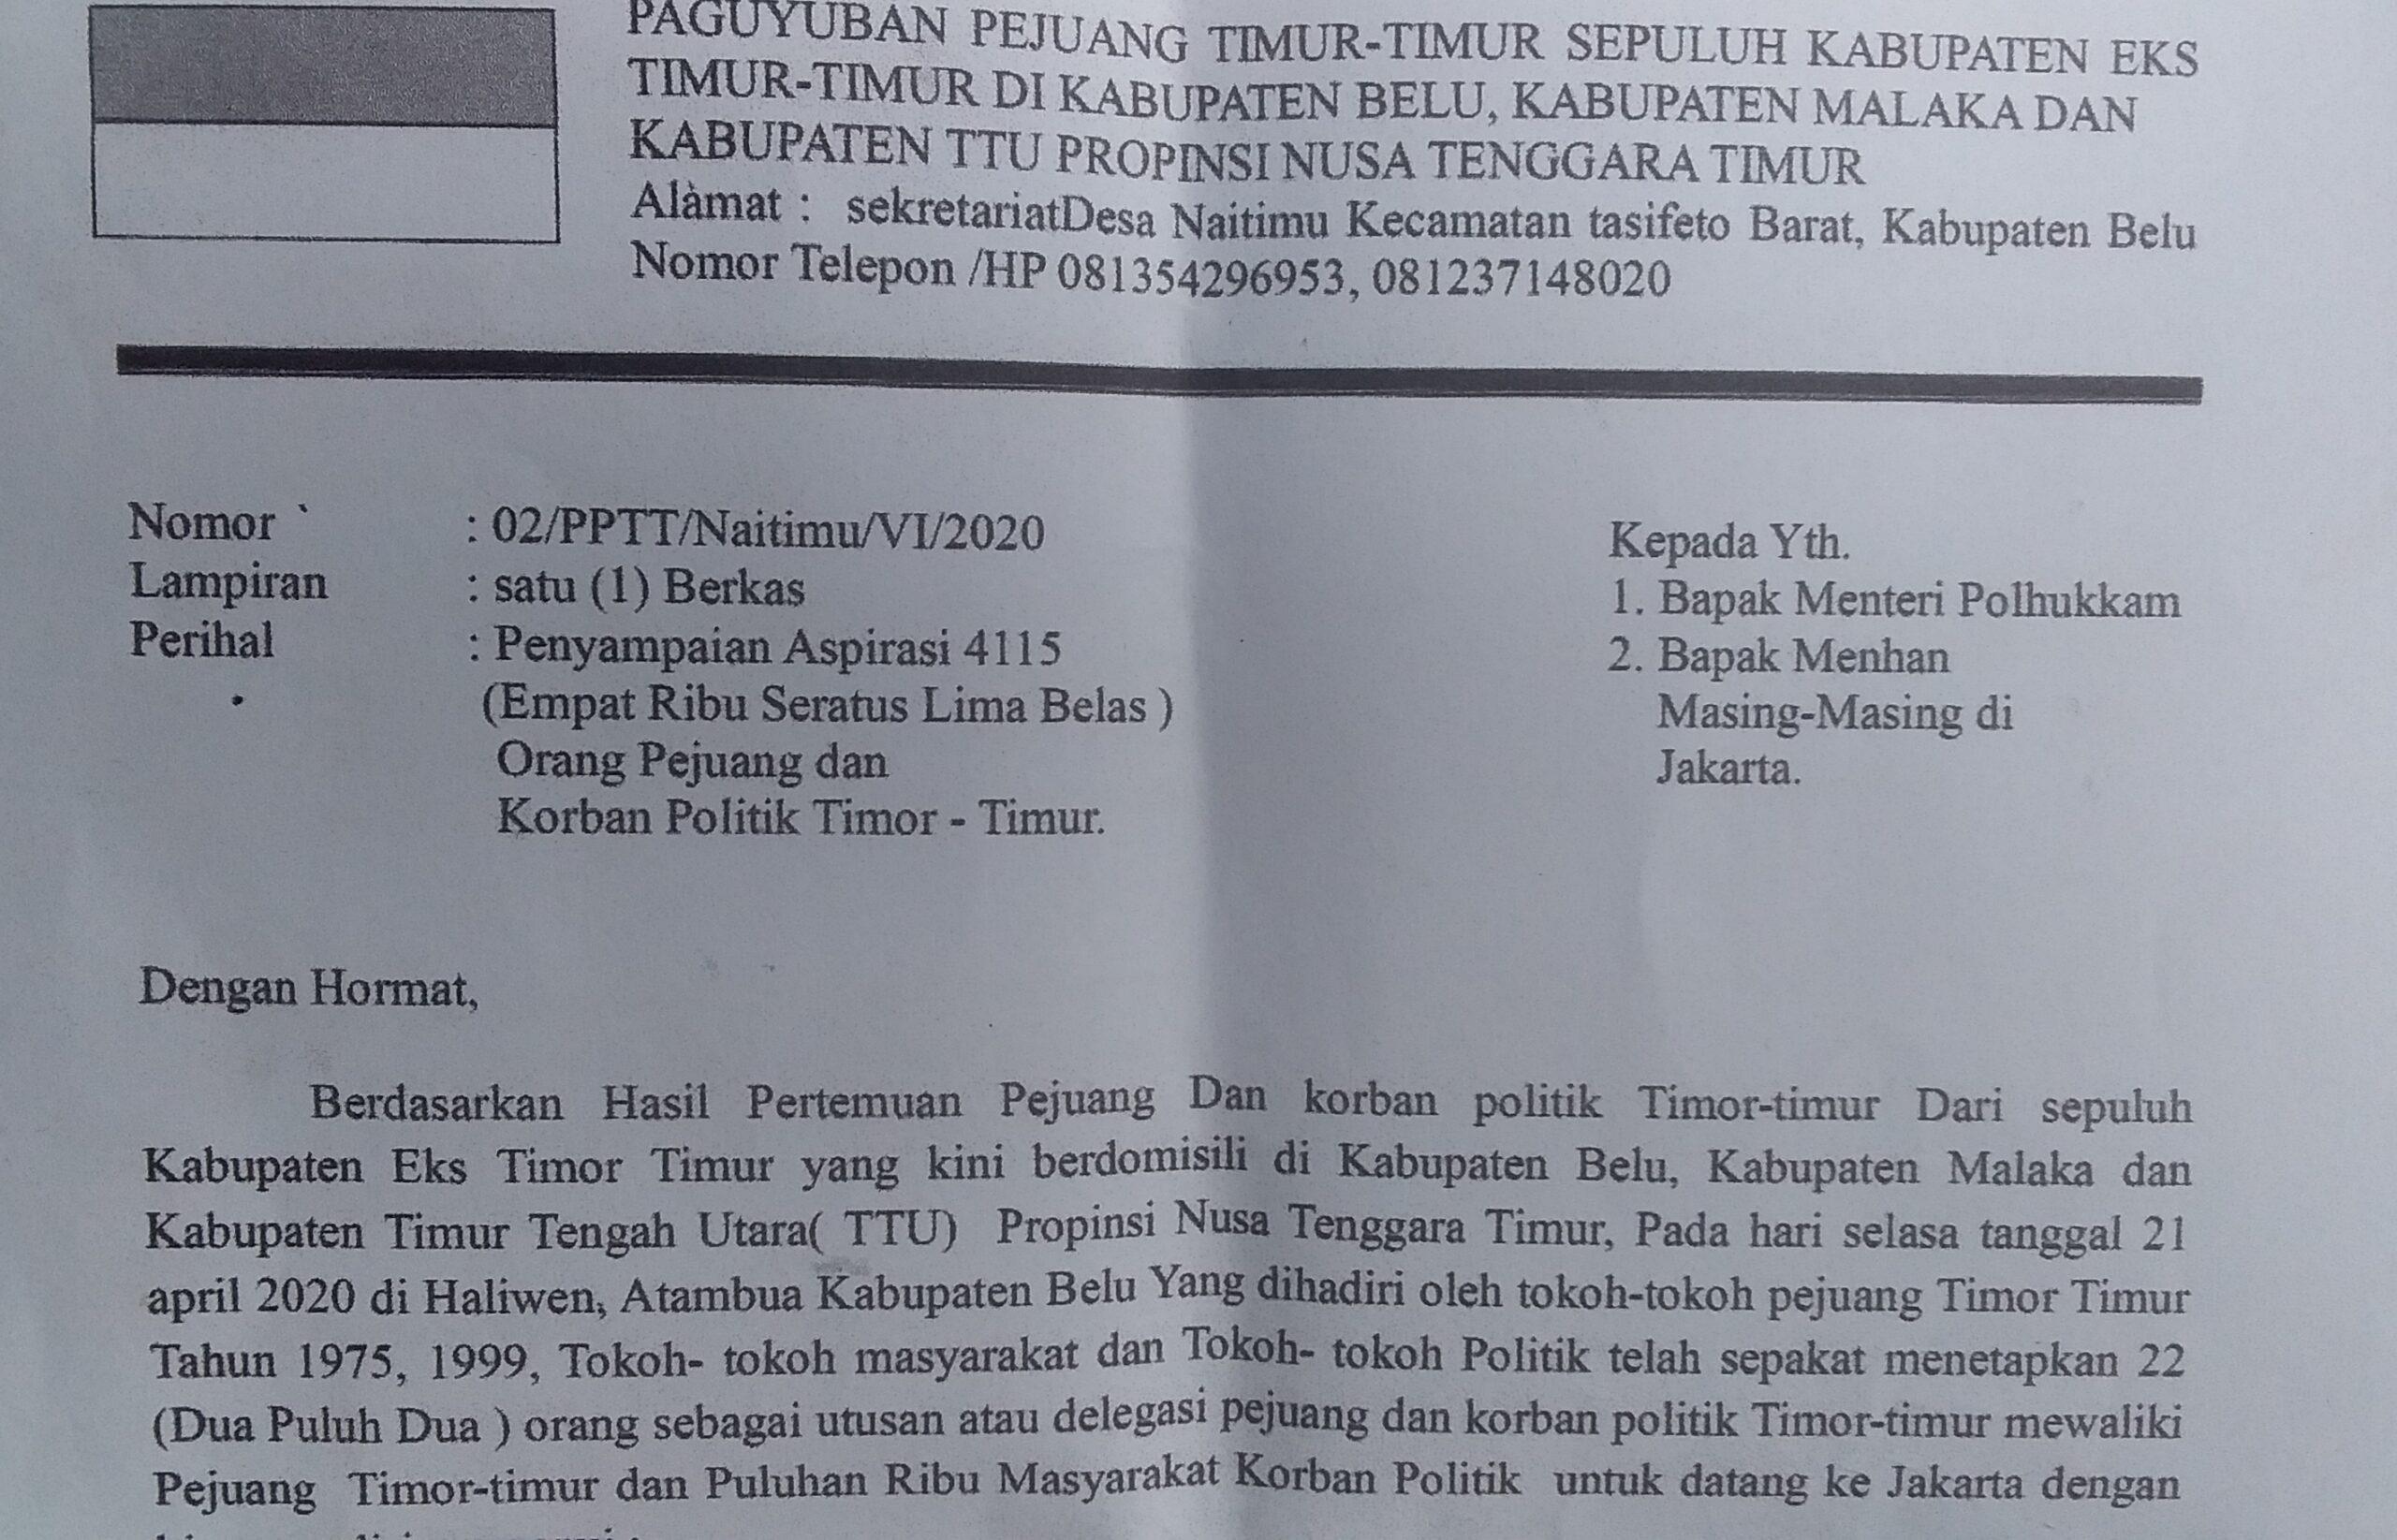 Sepucuk Surat Cinta Pejuang Eks Timor Timur Buat Menkopolhukam Flobamora News